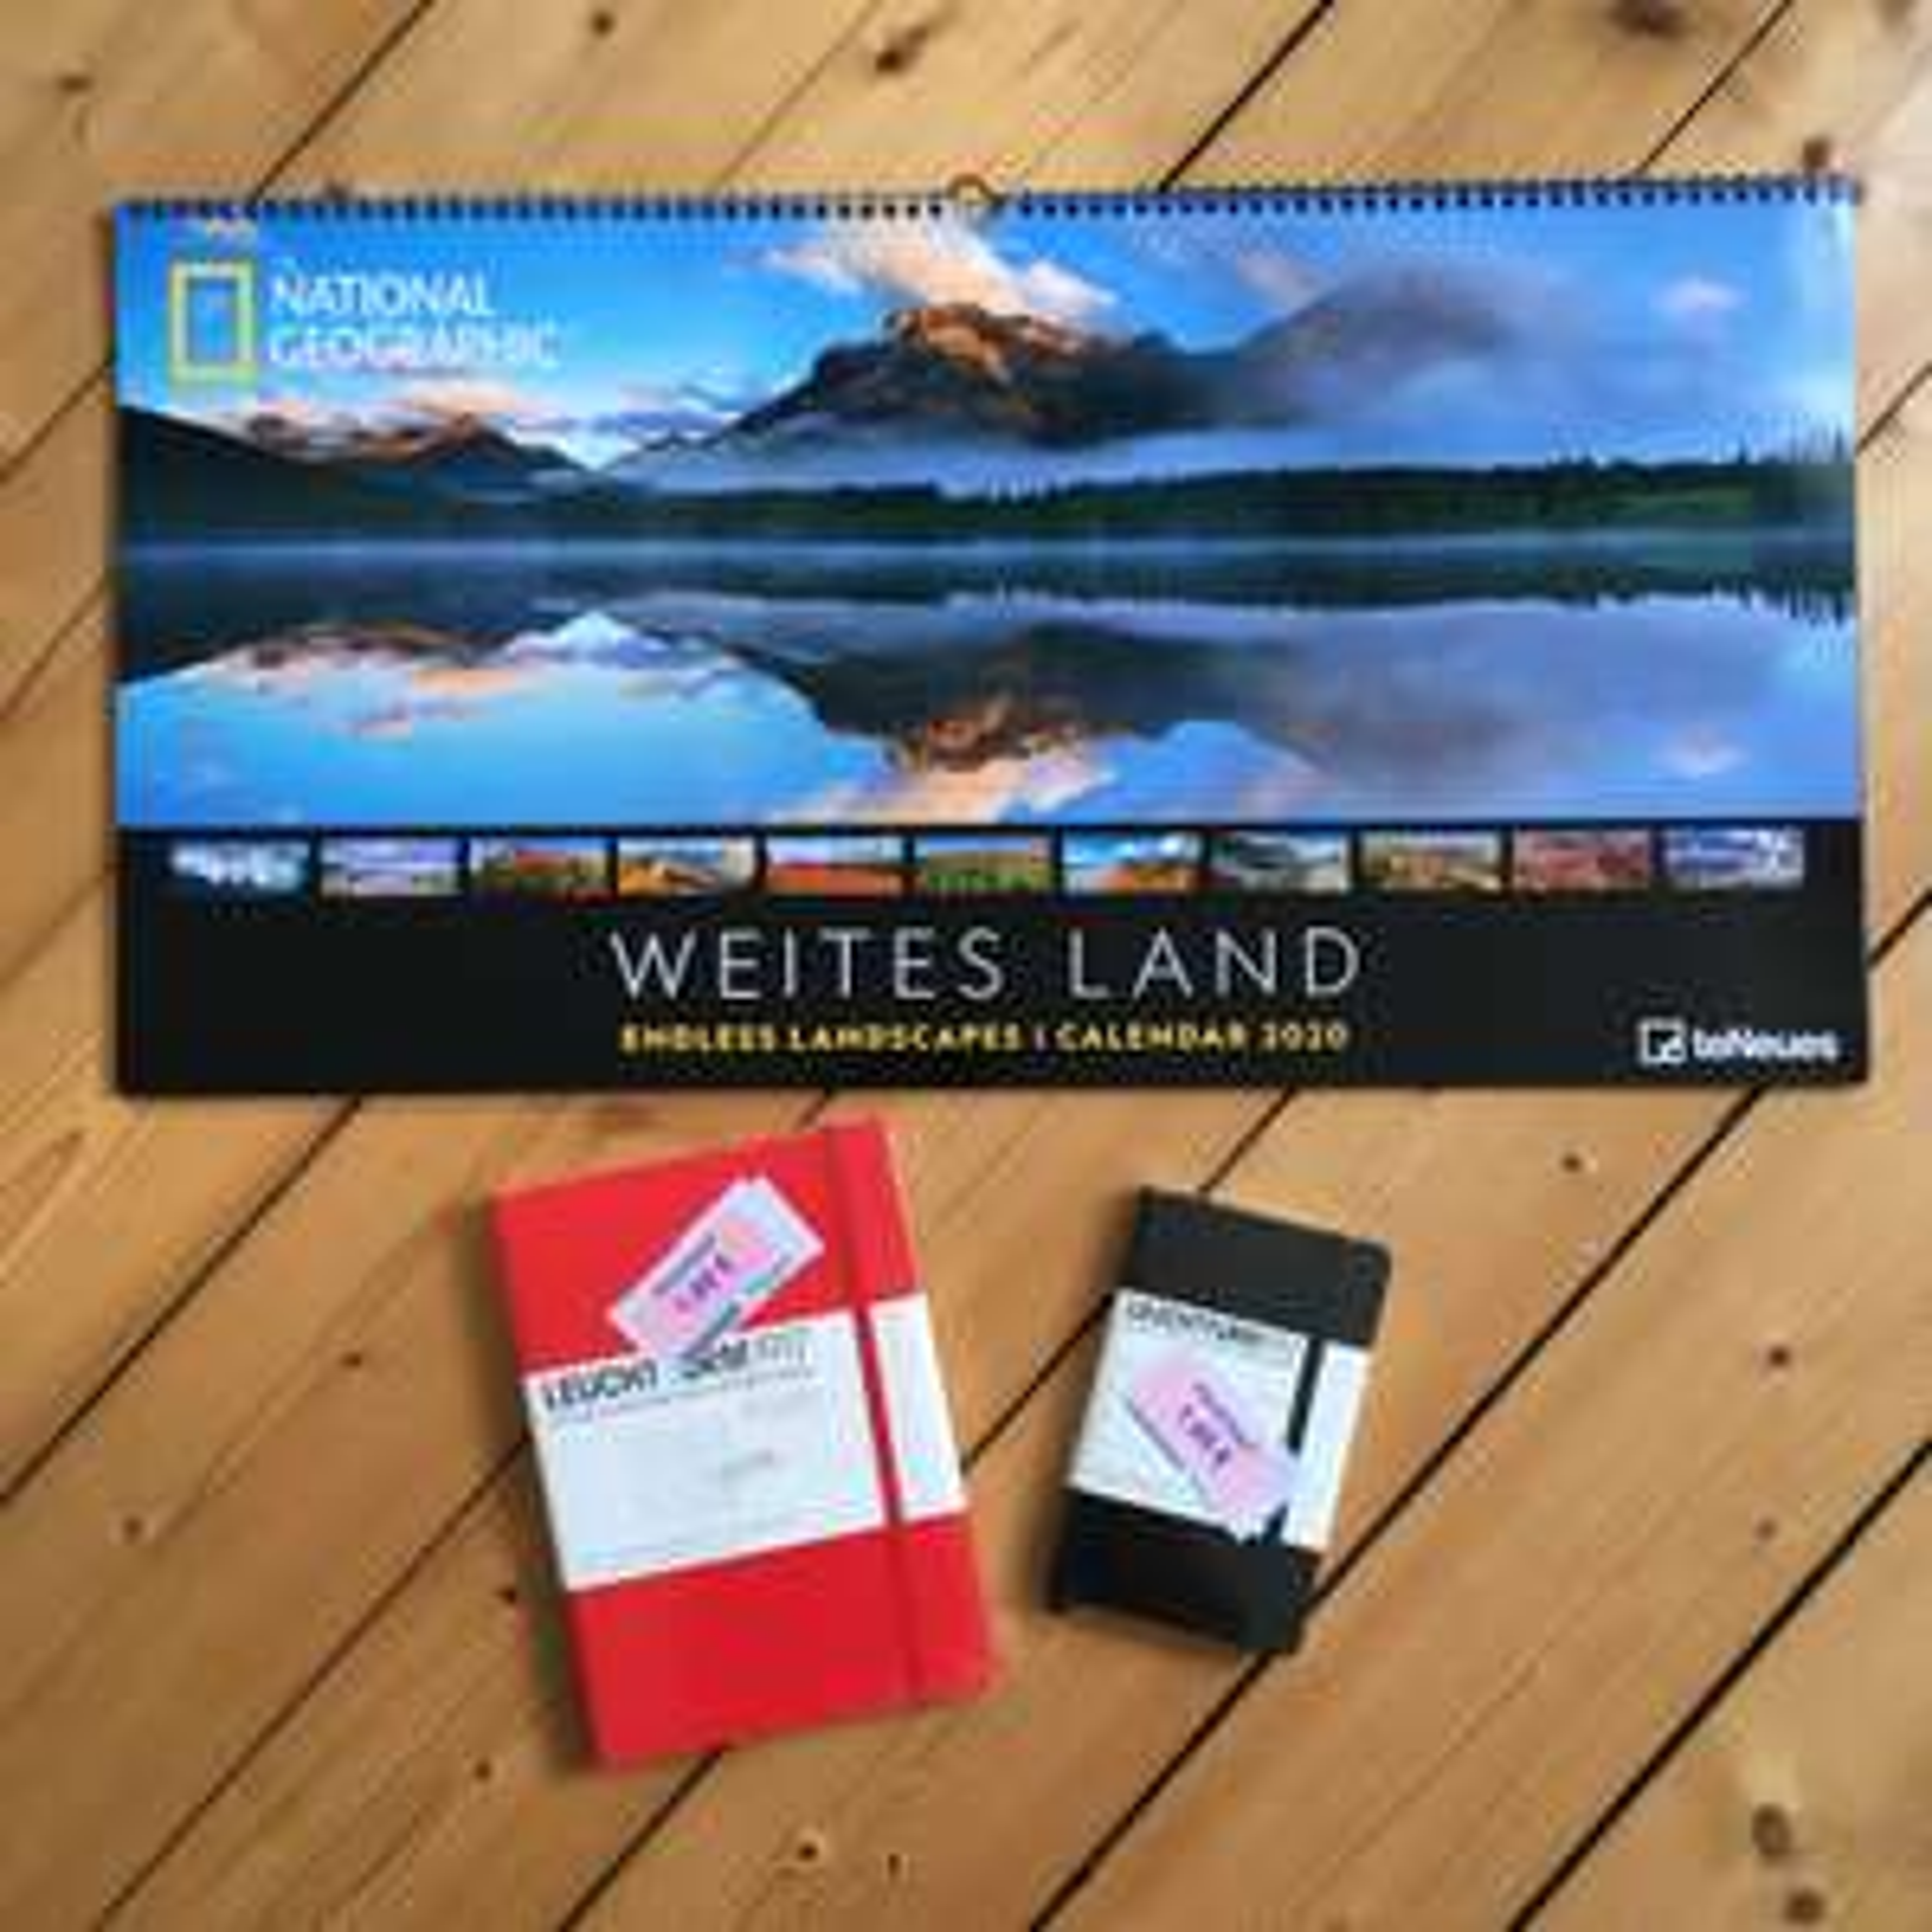 2020 Leuchtturm (Die Marke) Kalender & Wandkalender (Thalia Linz)